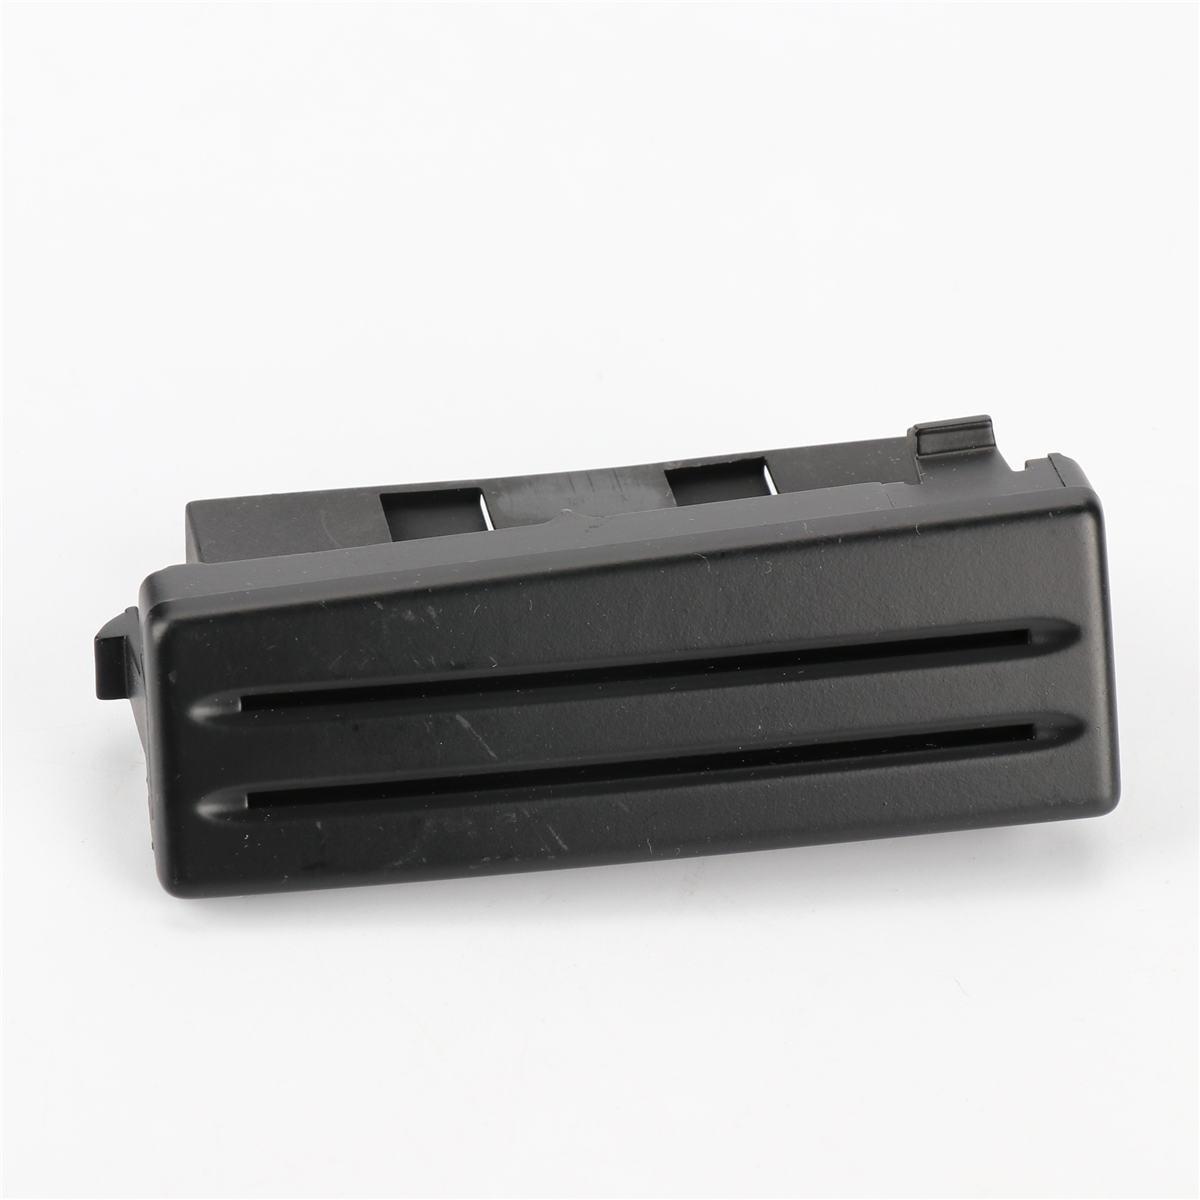 1pc High Quality Black Card Slot For VW Polo 2006-2012 6Q1 858 373 1QB